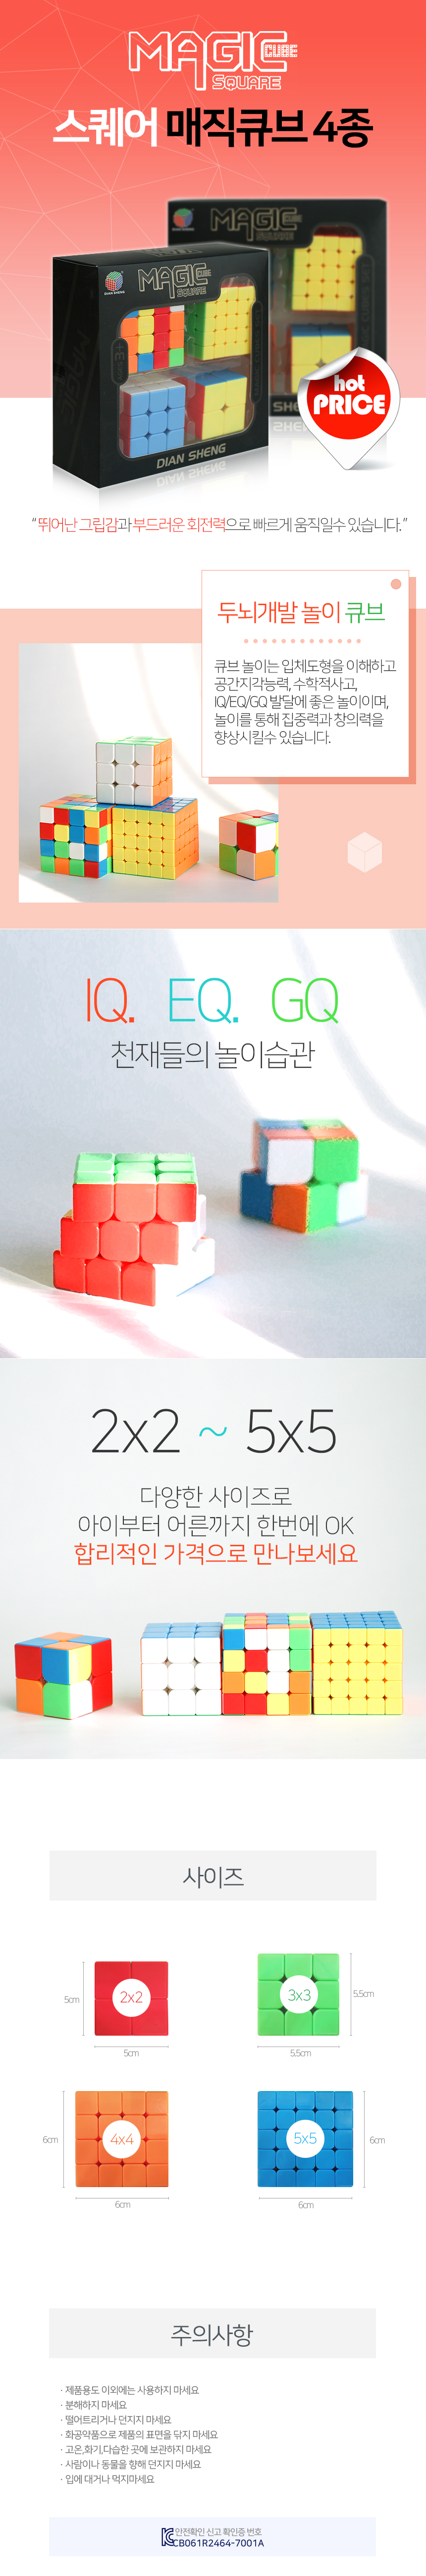 sq_cube.jpg